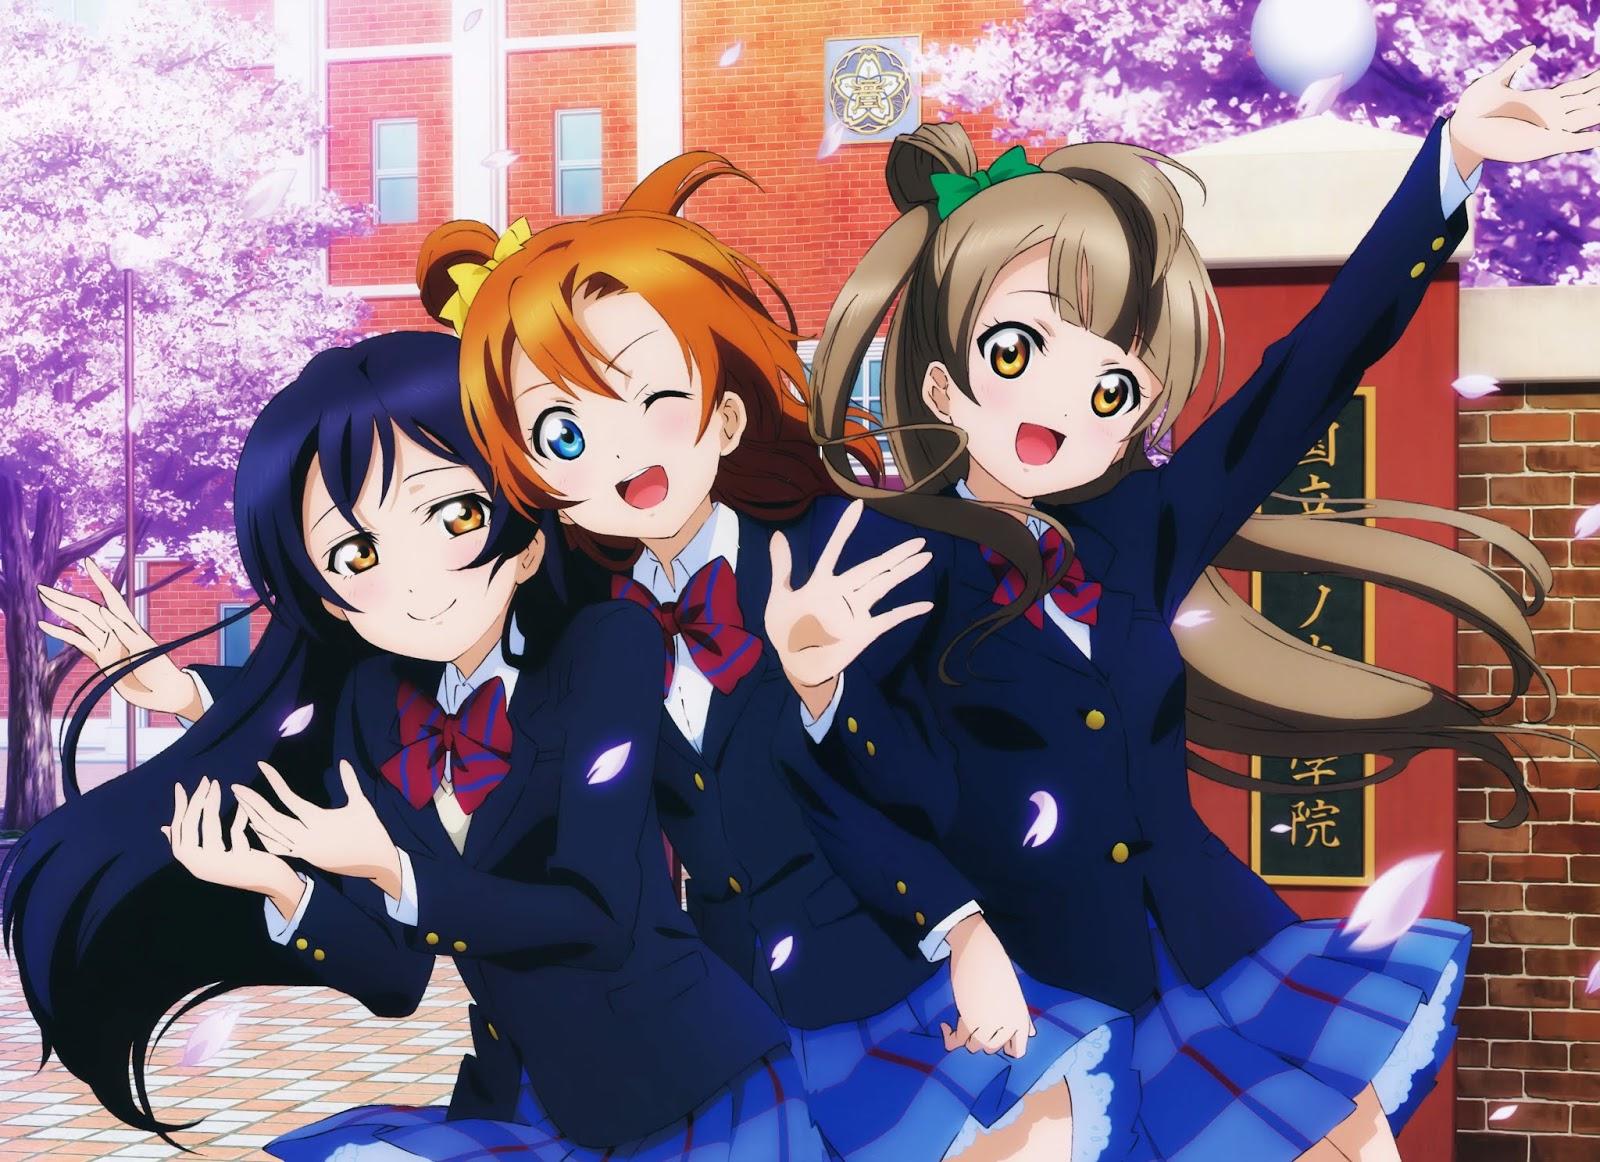 Wallpaper Anime Love Live Night Part 1